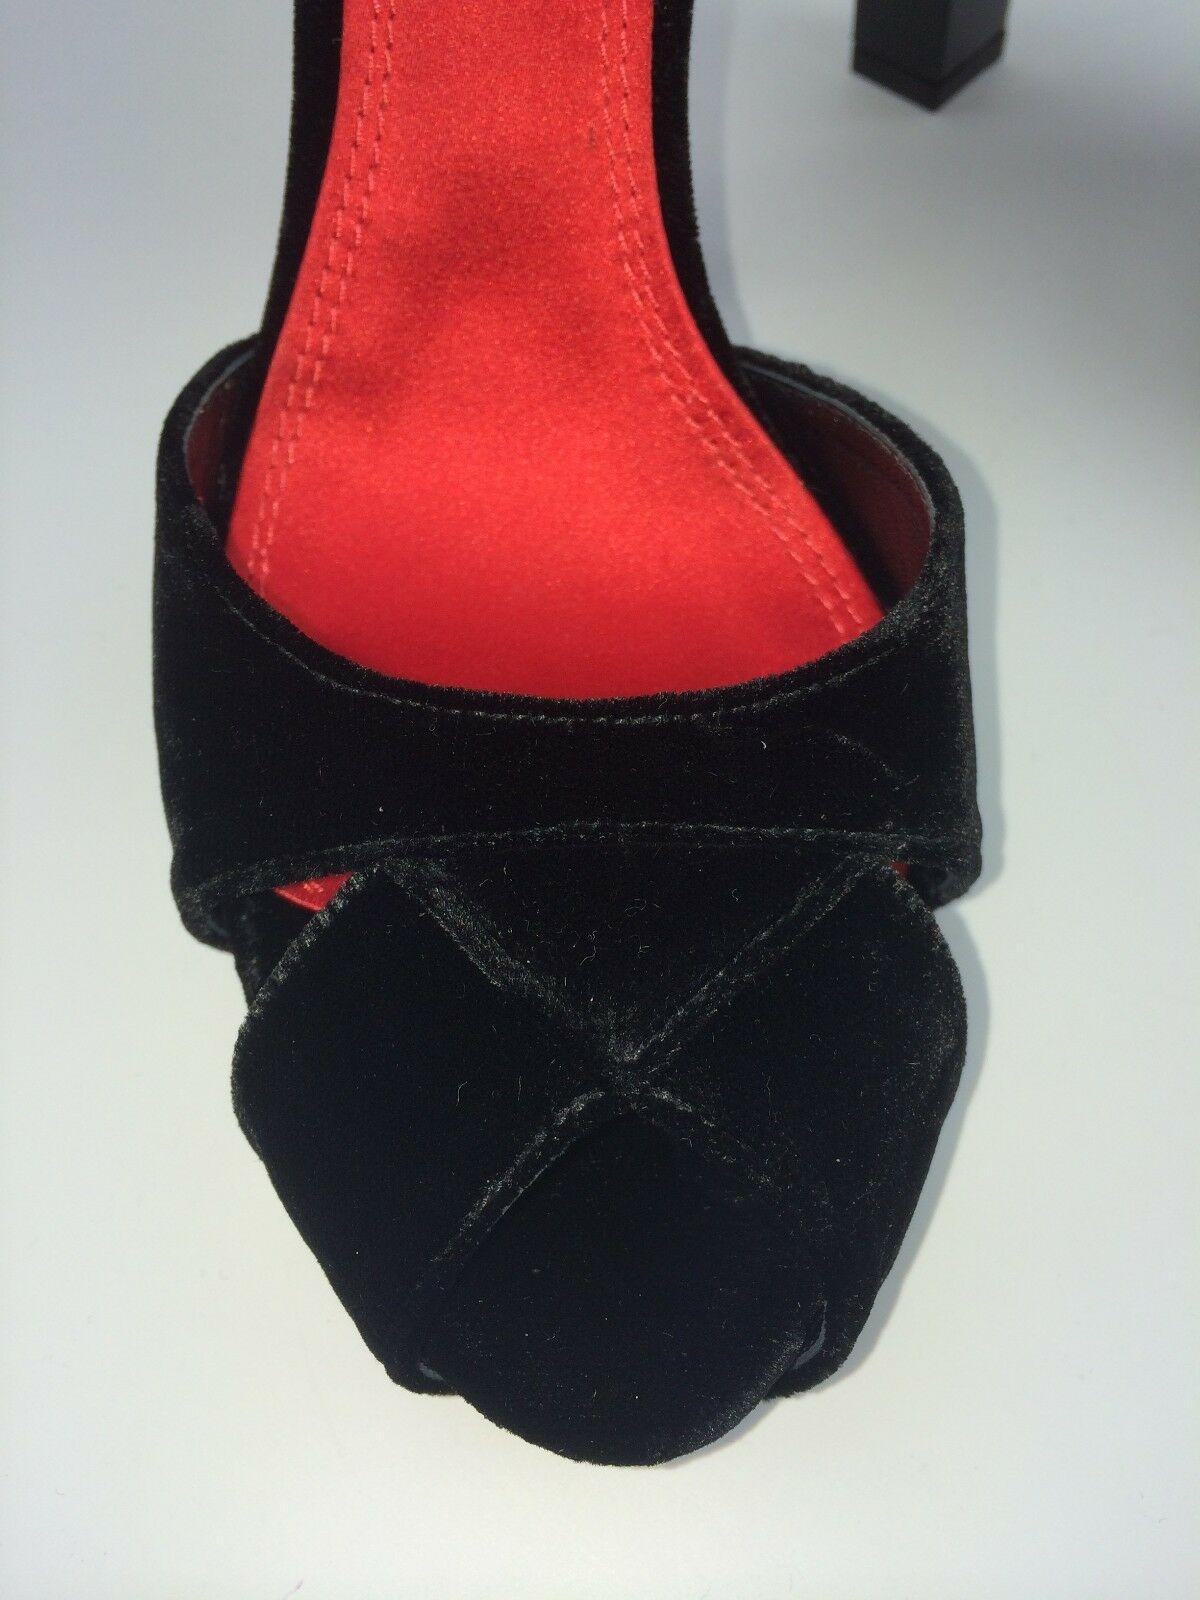 Ralph Velour Lauren Velour Ralph Dress Lacquer Heel Sandals size 9. Retail  650 aff6dd